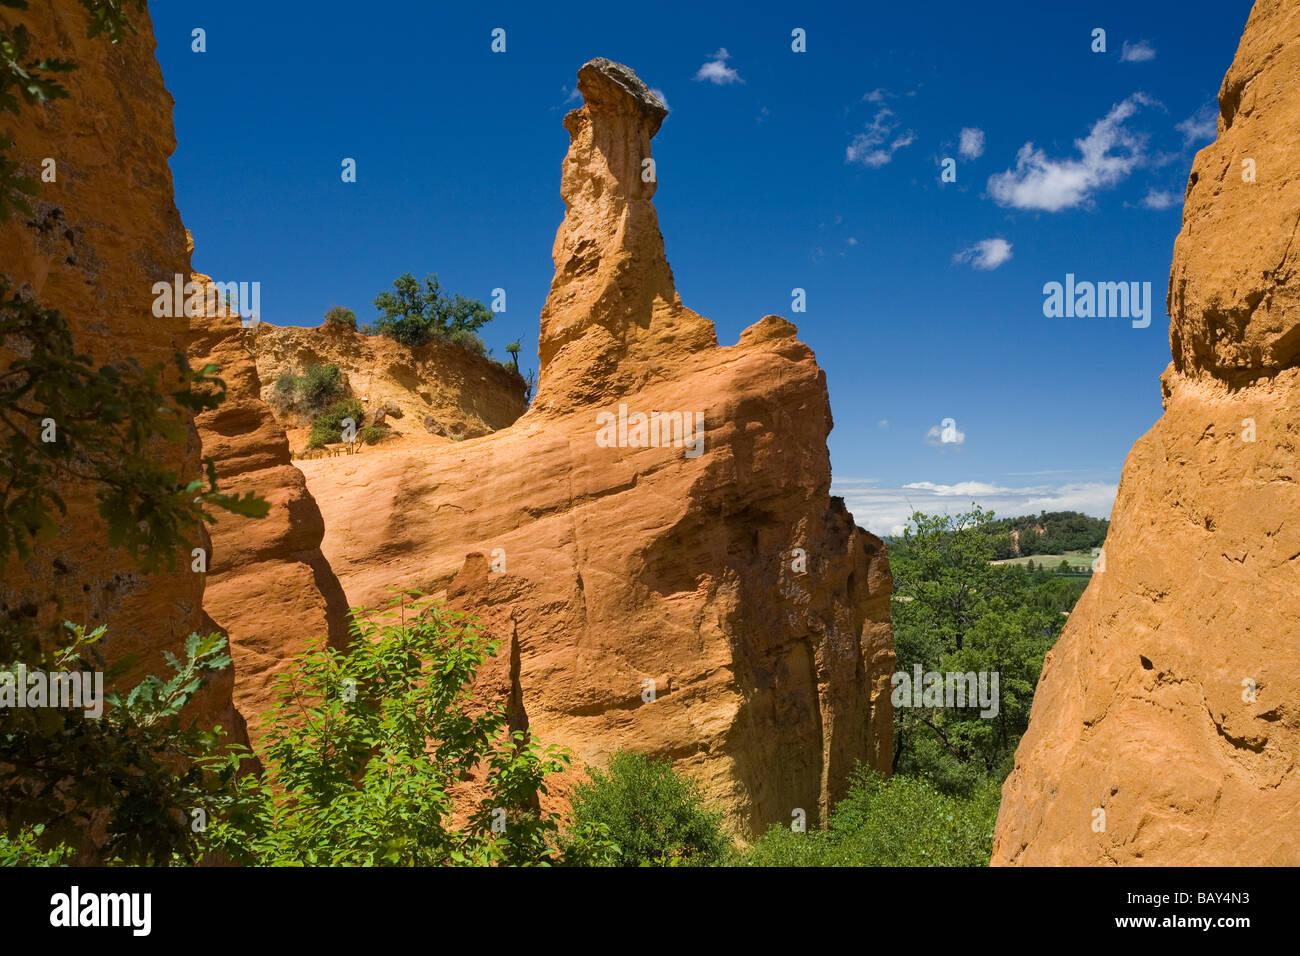 Colorado Provencal, rocks of ochre under a blue sky, Rustrel, Vaucluse, Provence, France - Stock Image